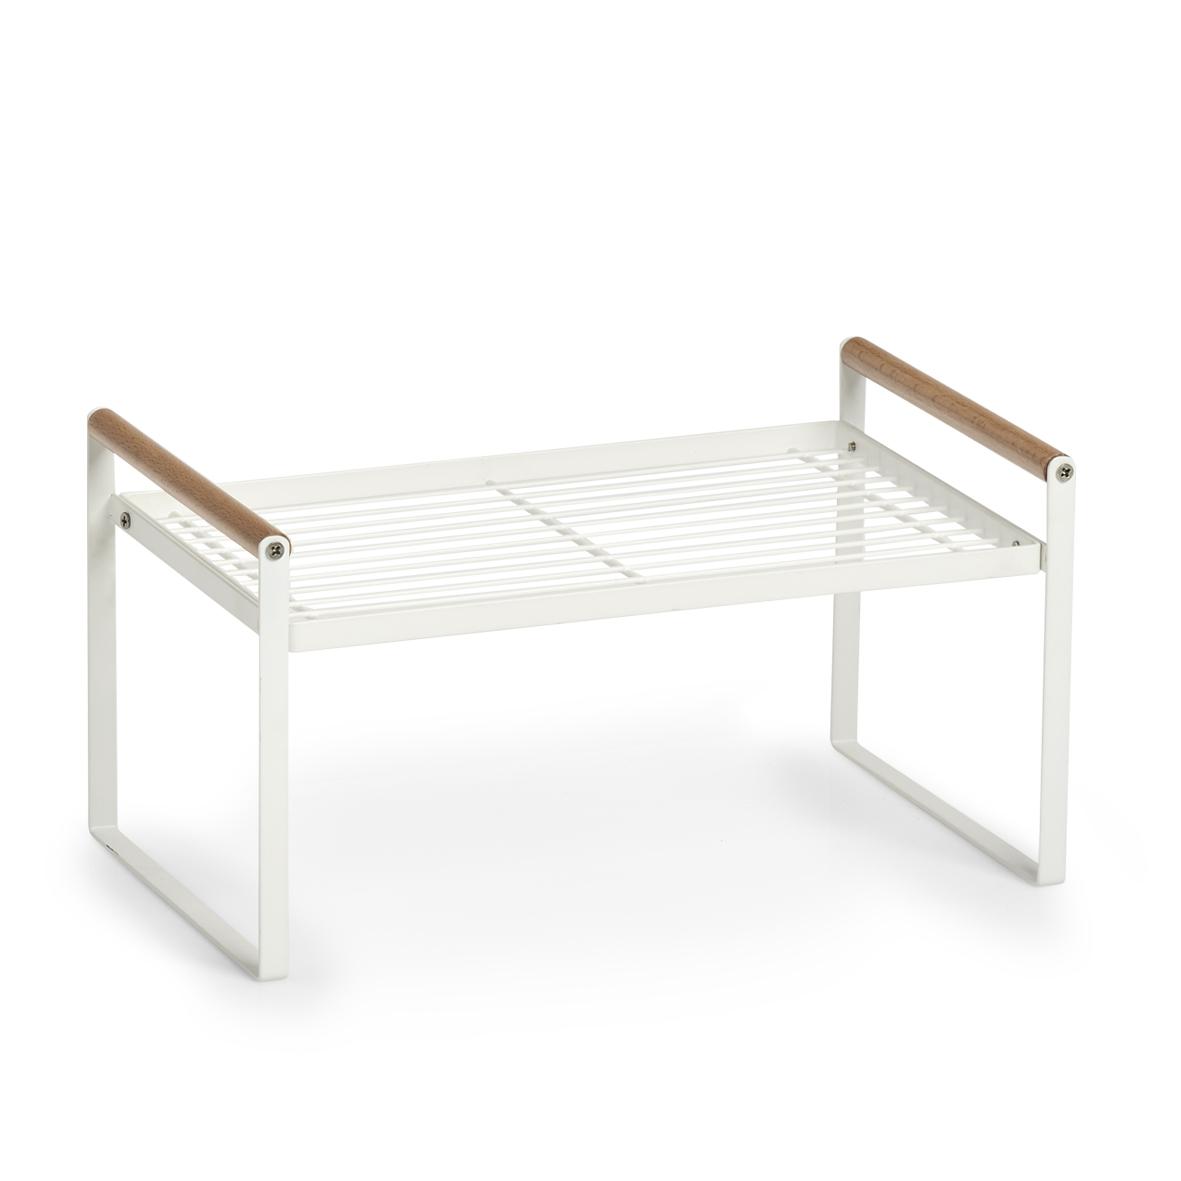 Raft universal din metal si lemn, Nordic Alb, l34,5xA21,5xH18 cm imagine